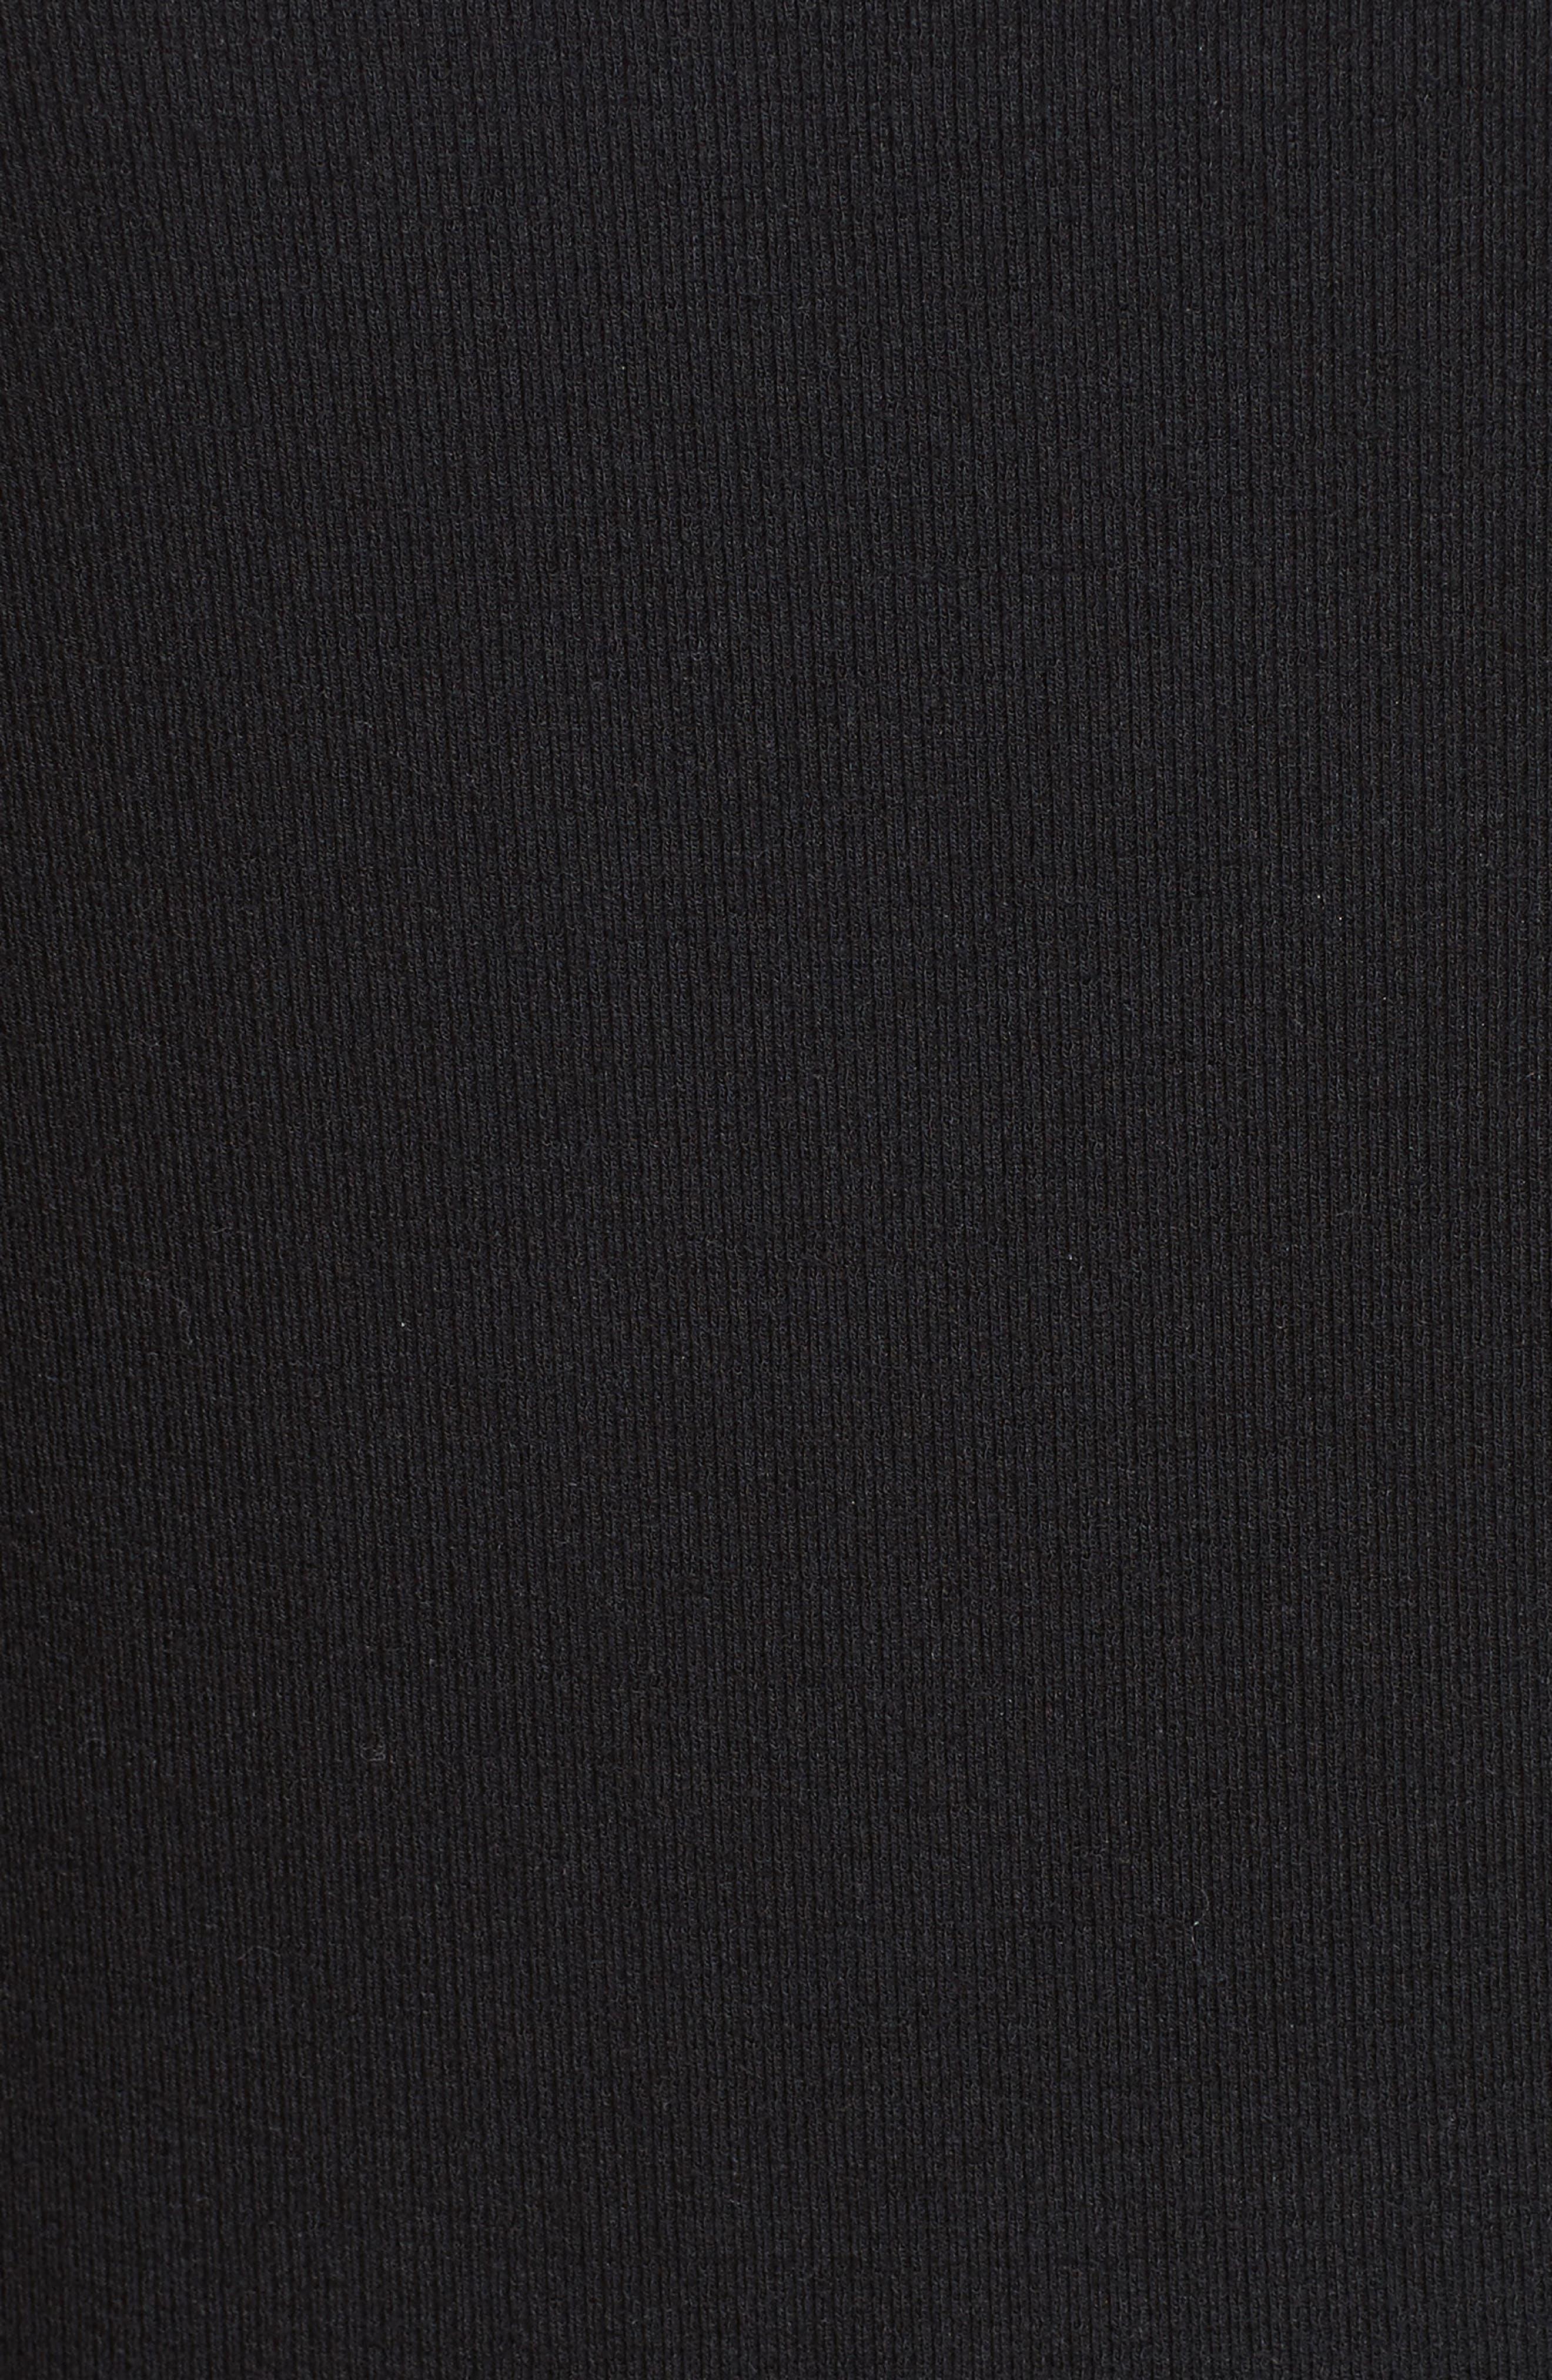 Off the Shoulder Rib Dress,                             Alternate thumbnail 5, color,                             001